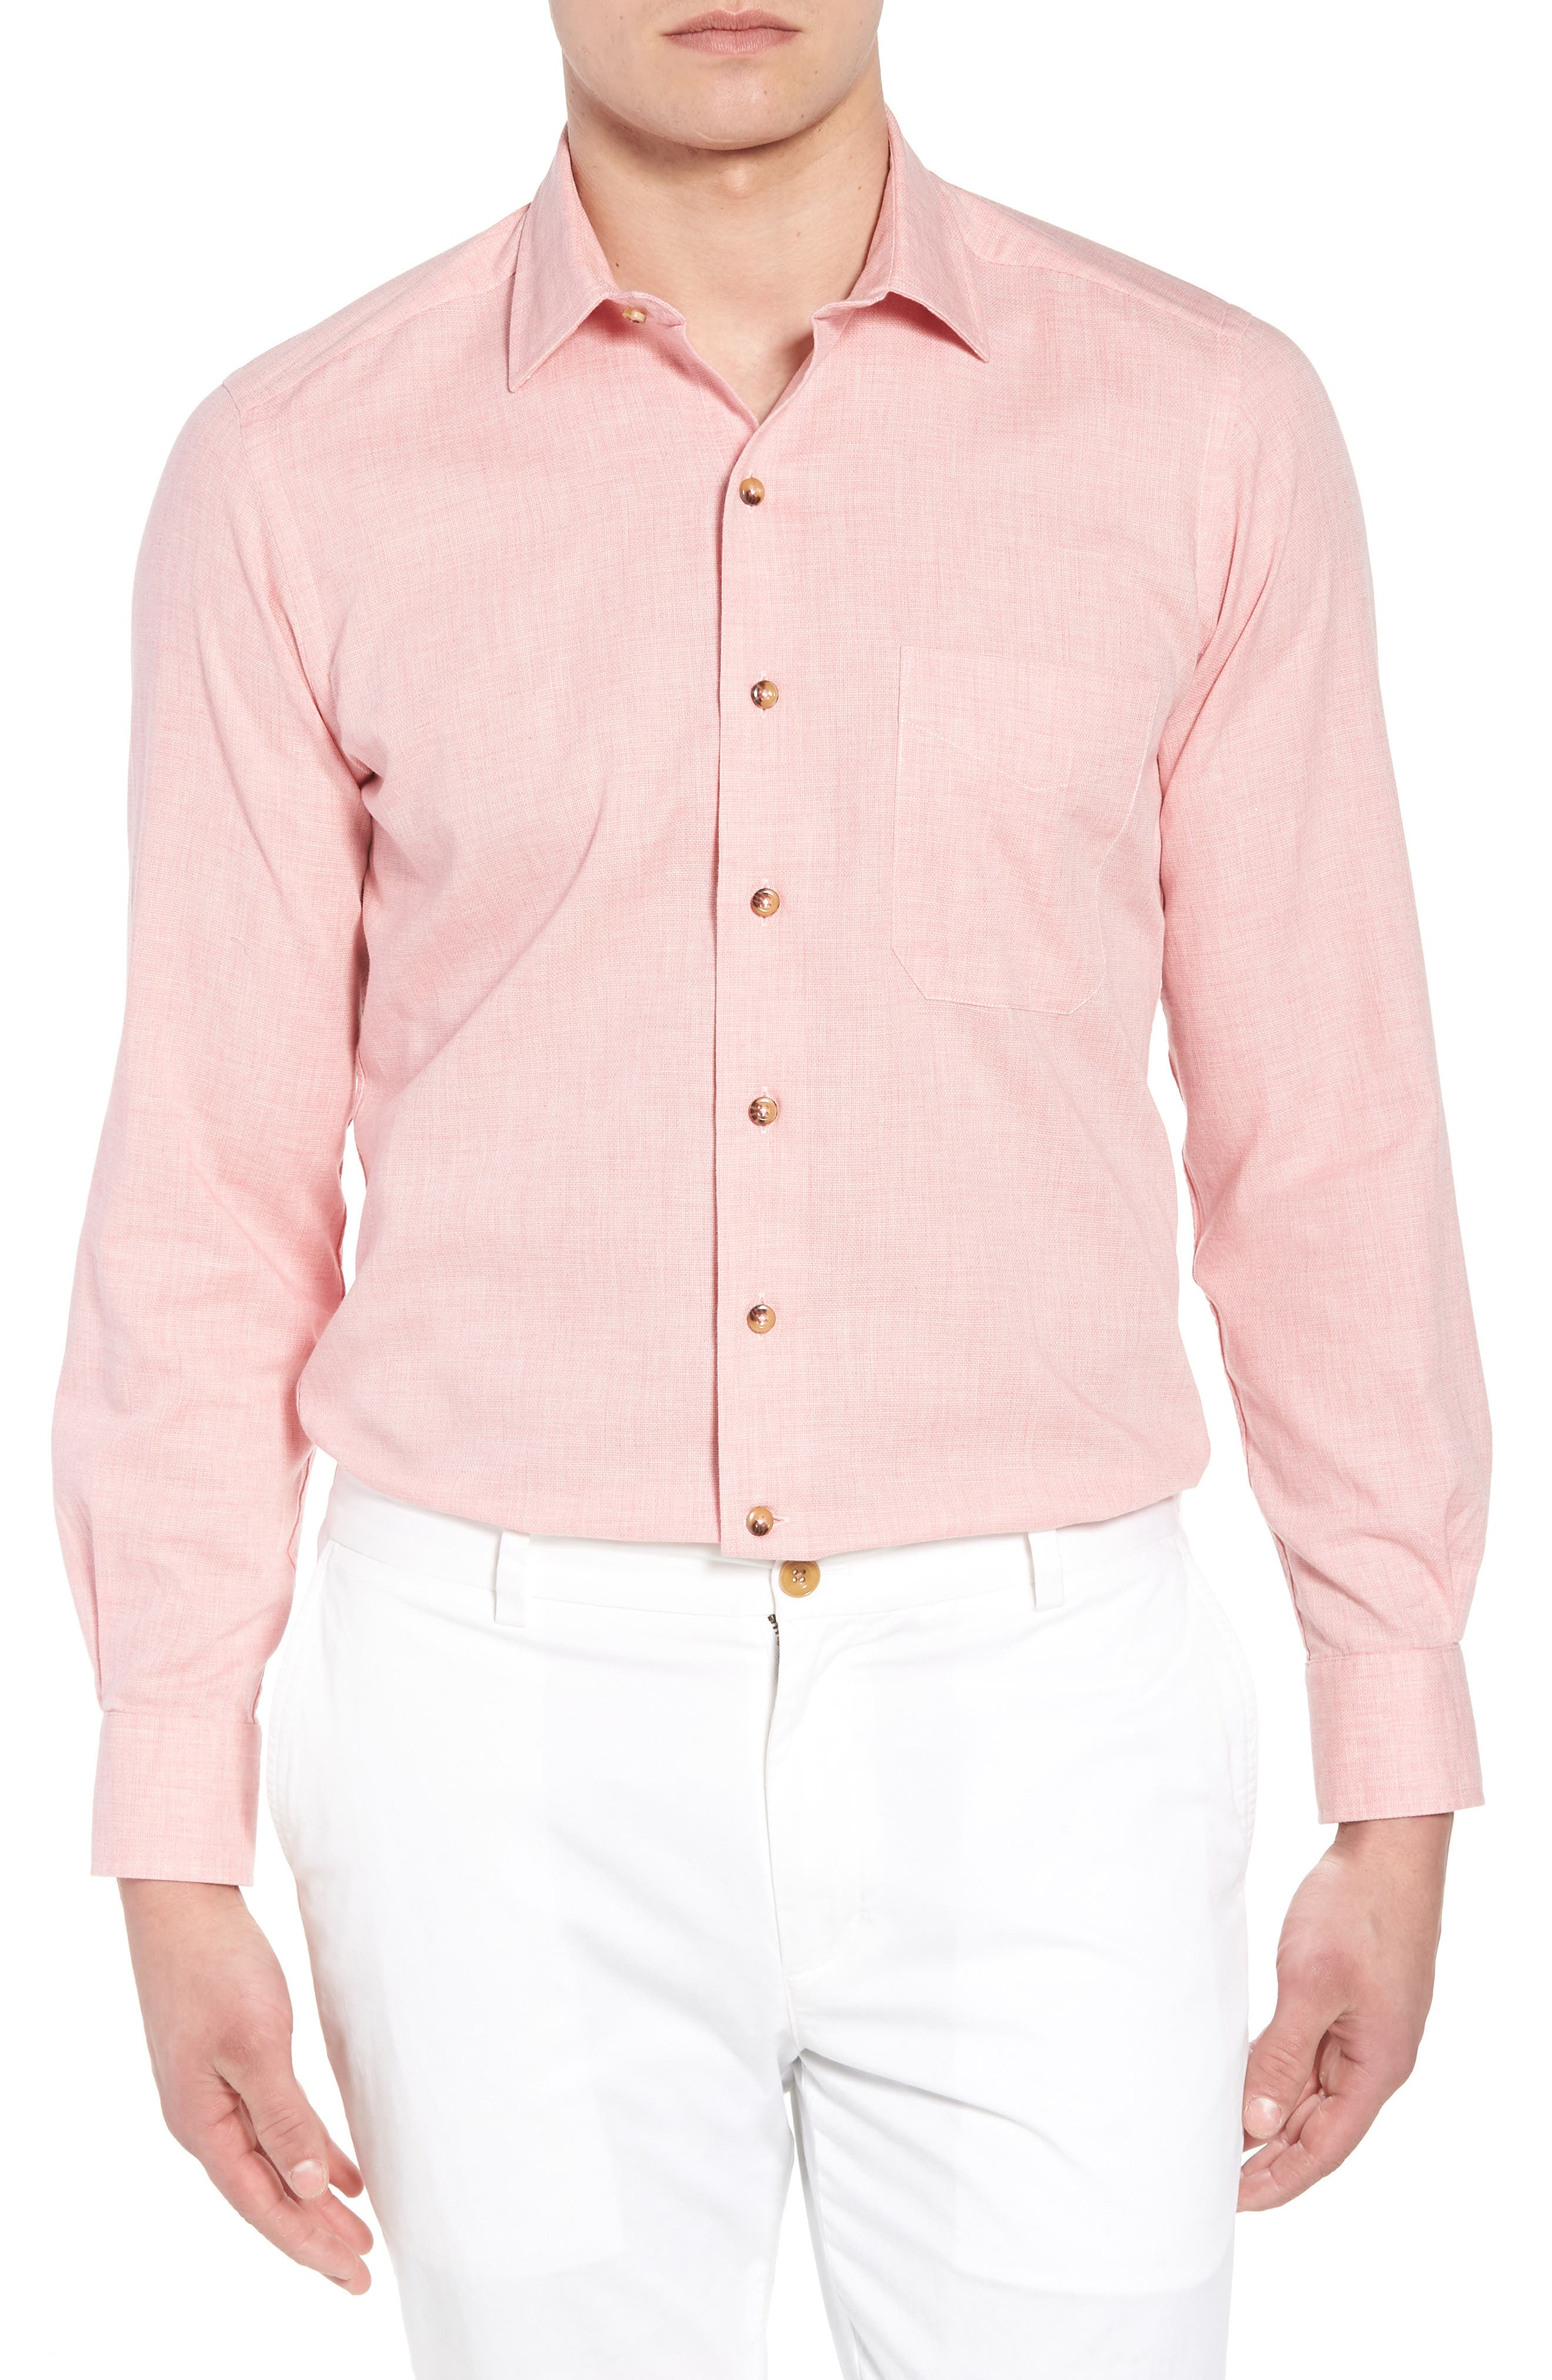 Regular Fit Garment Washed Mélange Sport Shirt,                             Main thumbnail 1, color,                             650